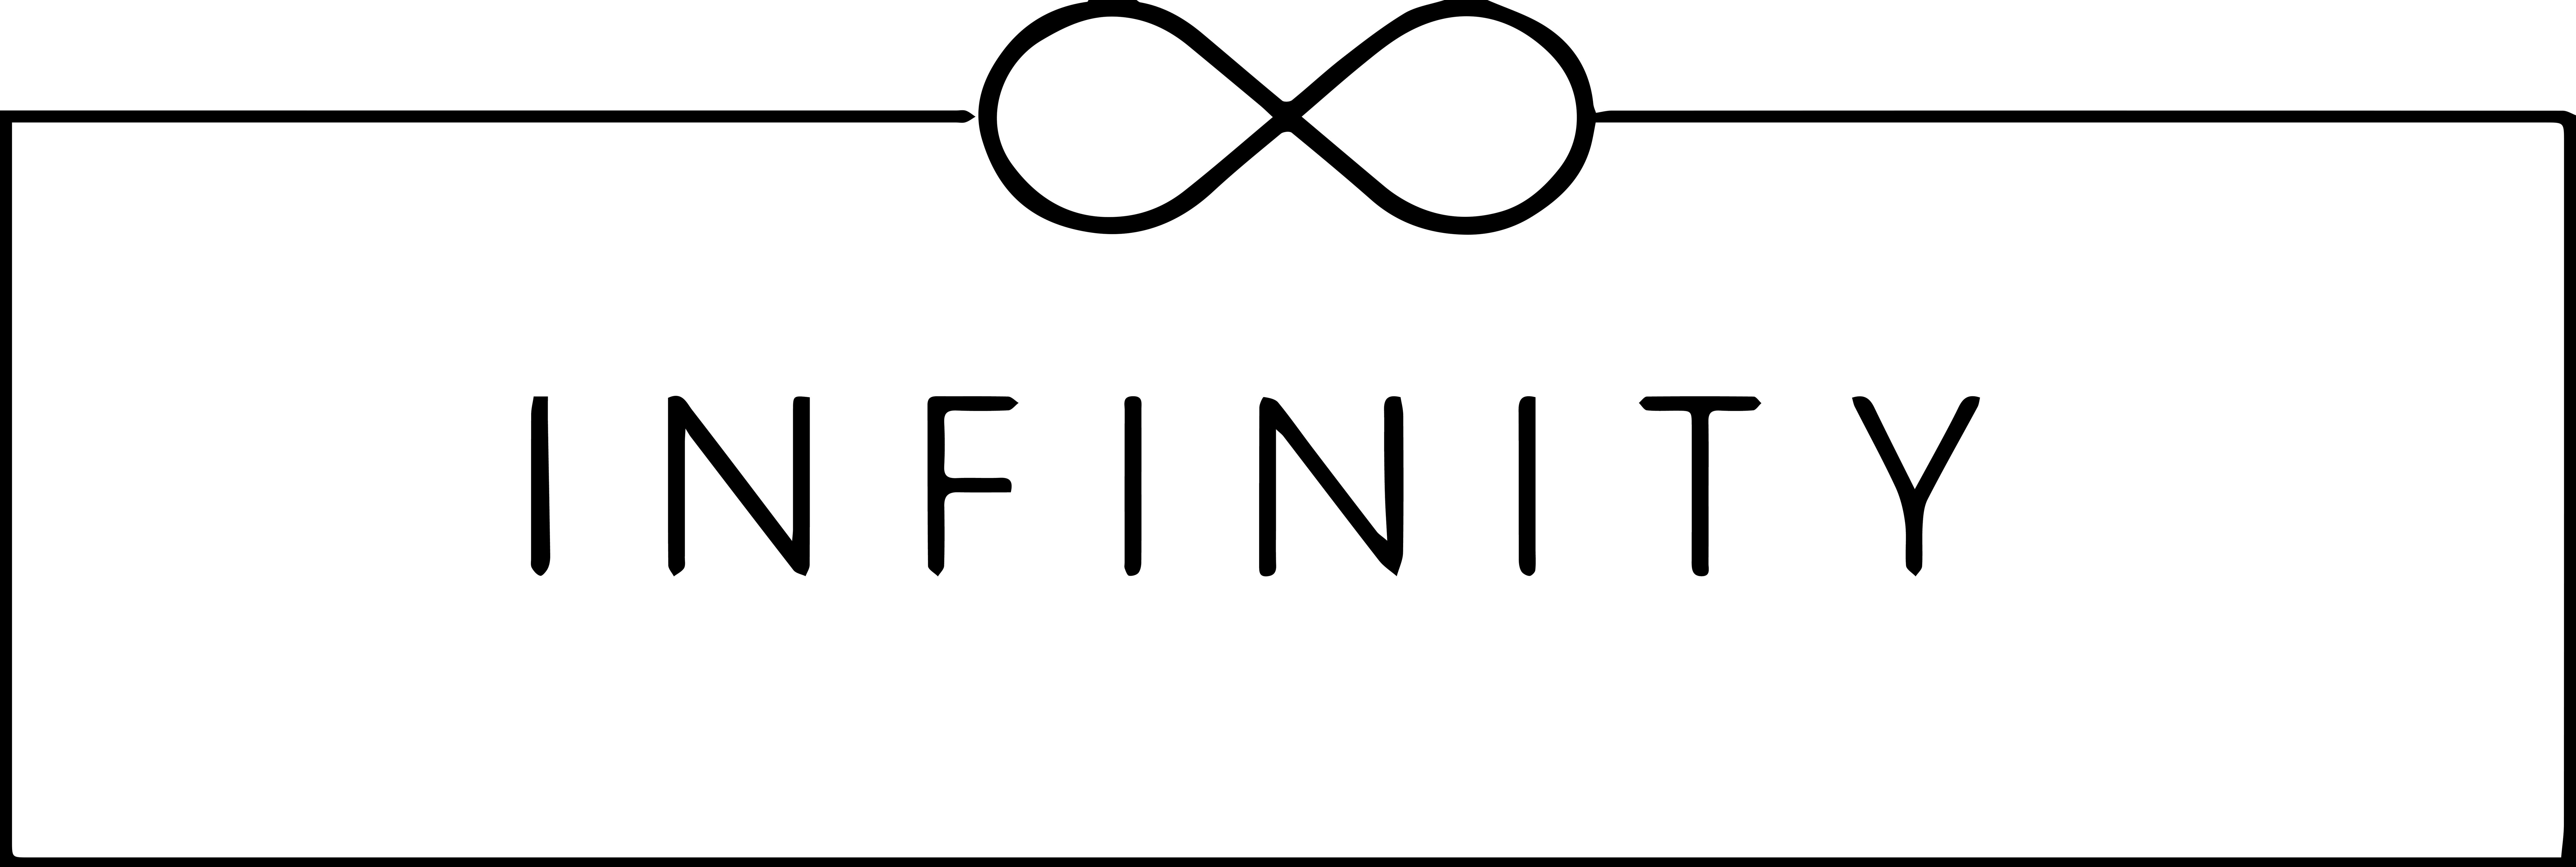 Infinity-flowerbox.com Logo